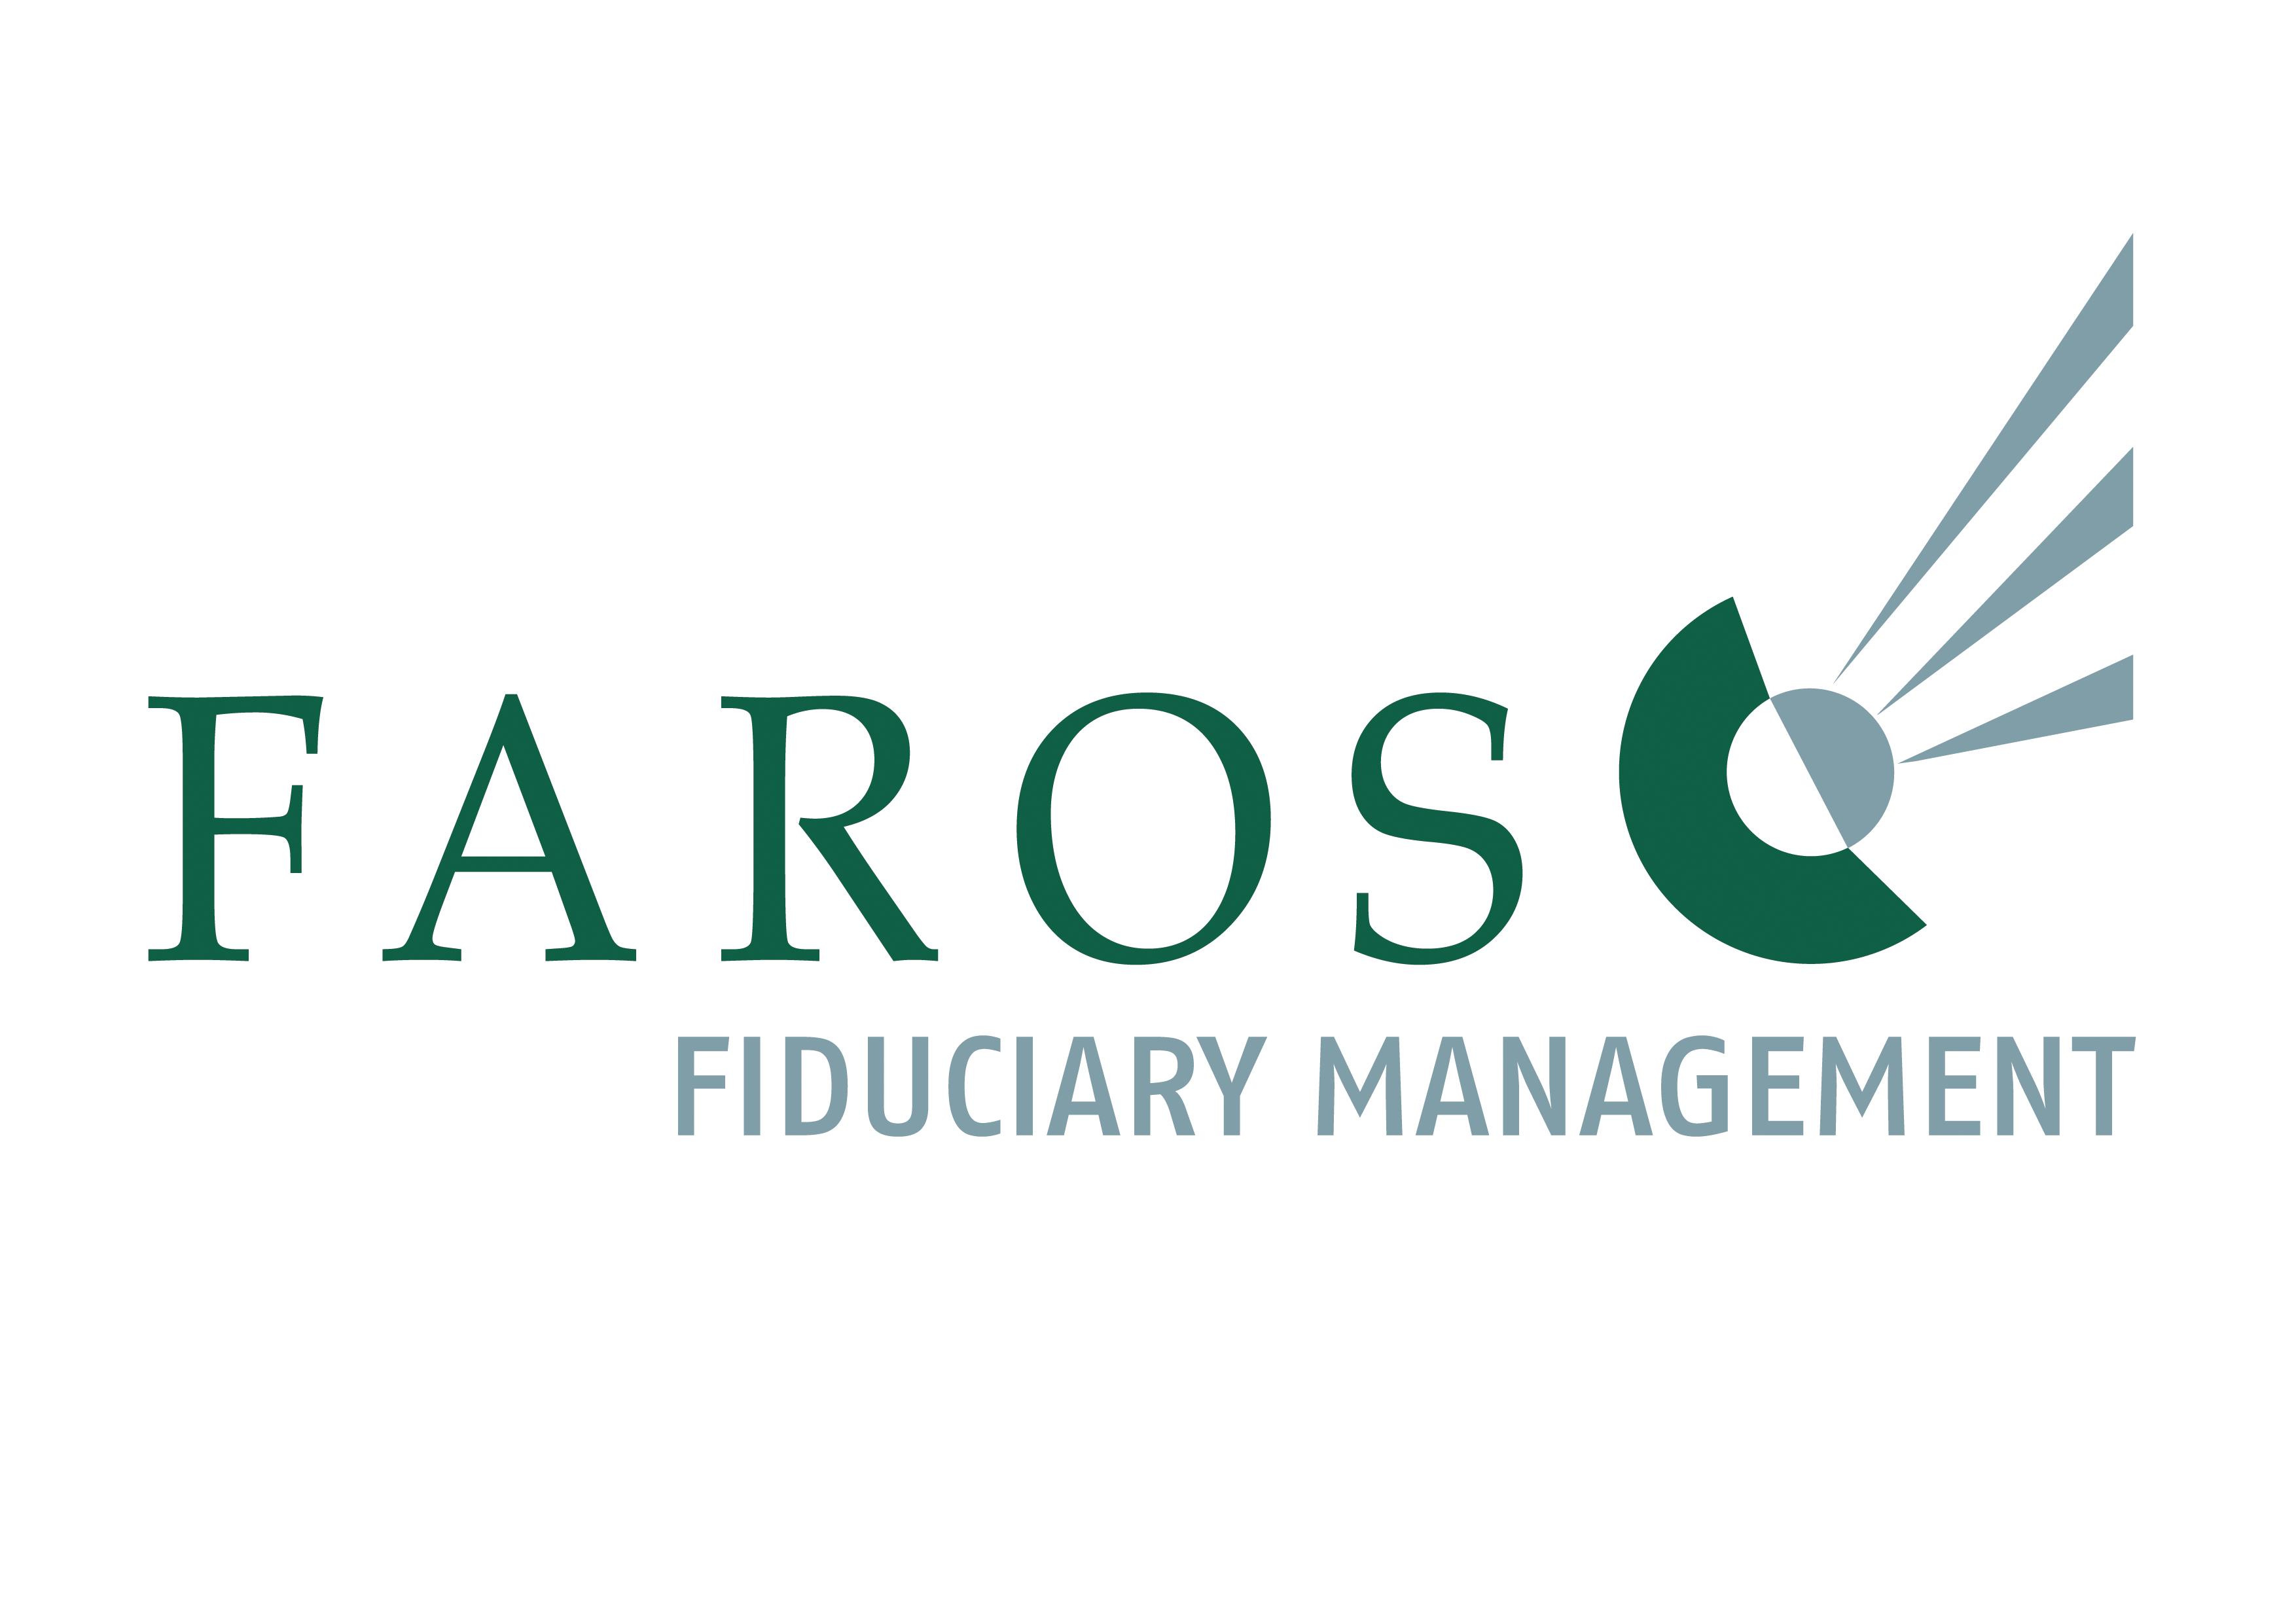 Faros Fiduciary